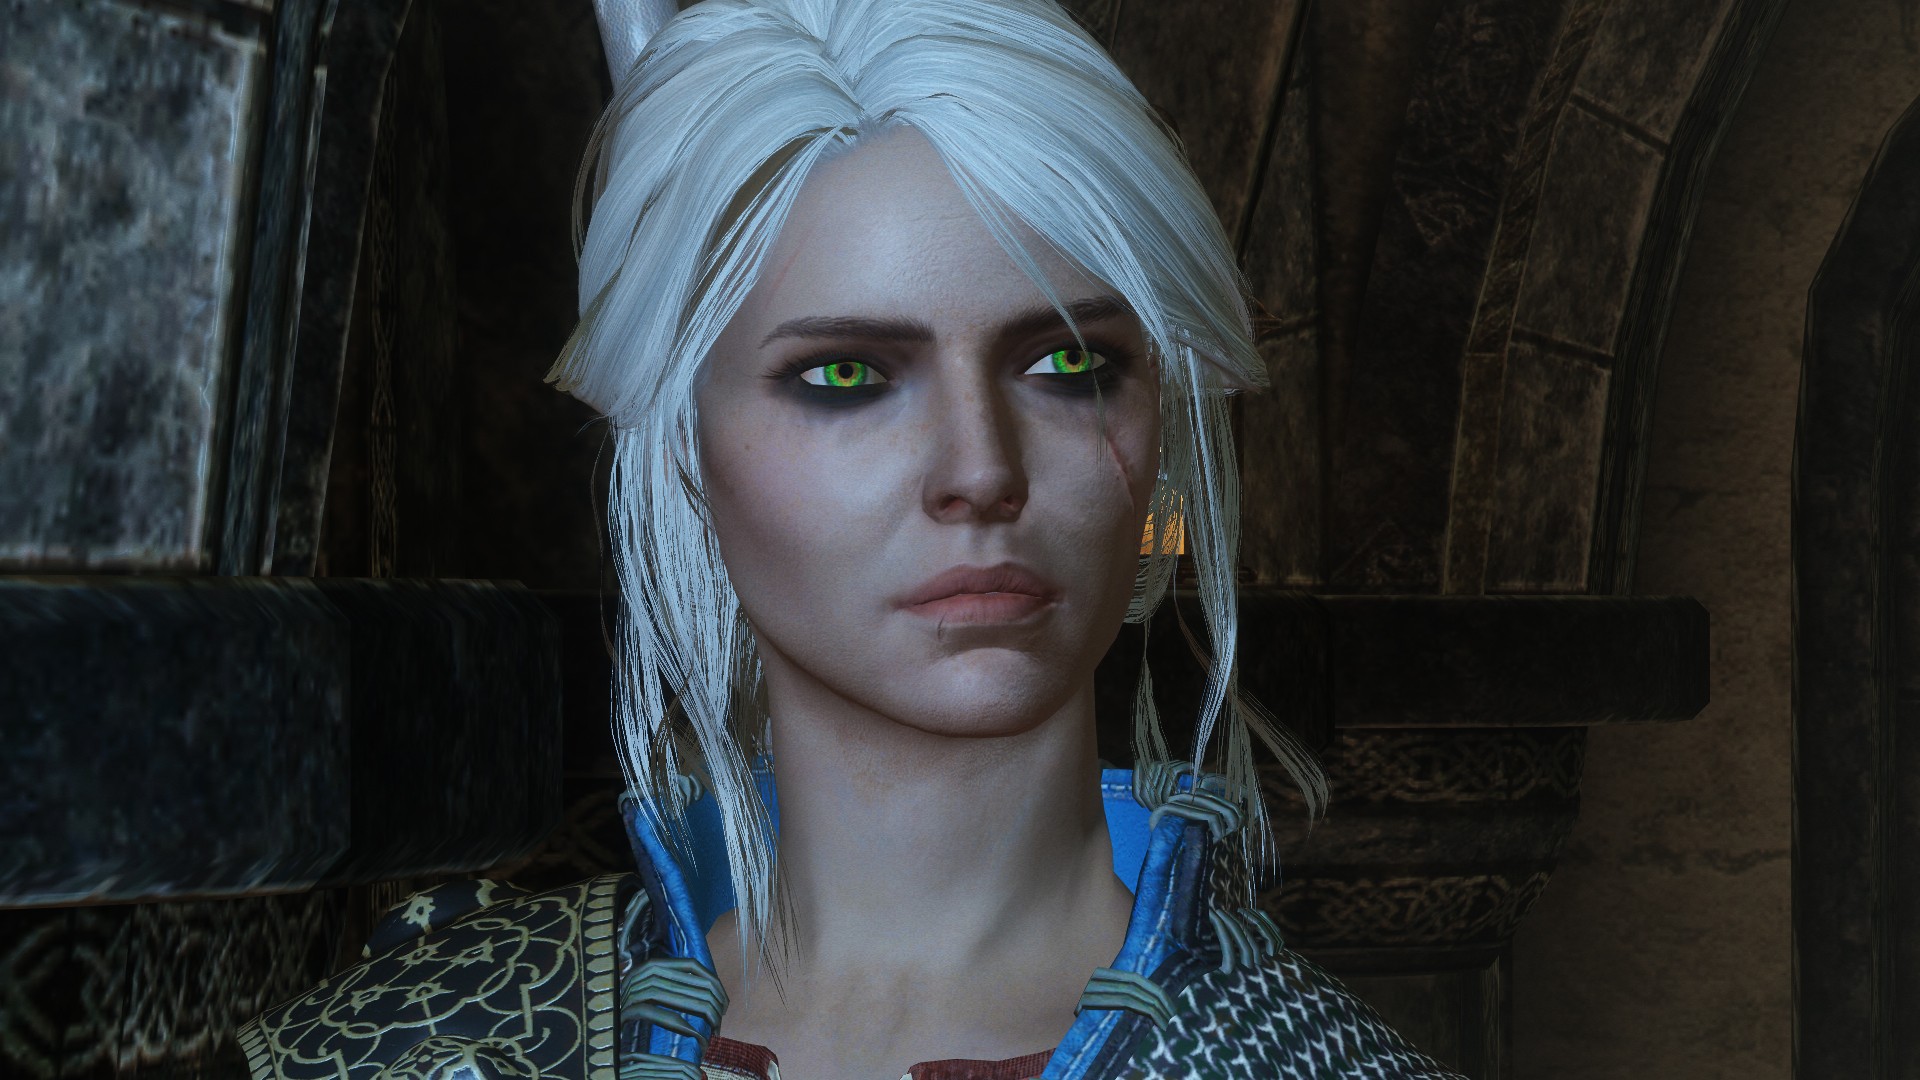 Cirilla Fiona Elen Riannon - Witcher 3 Voiced Follower | Цири - компаньон из Ведьмак 3